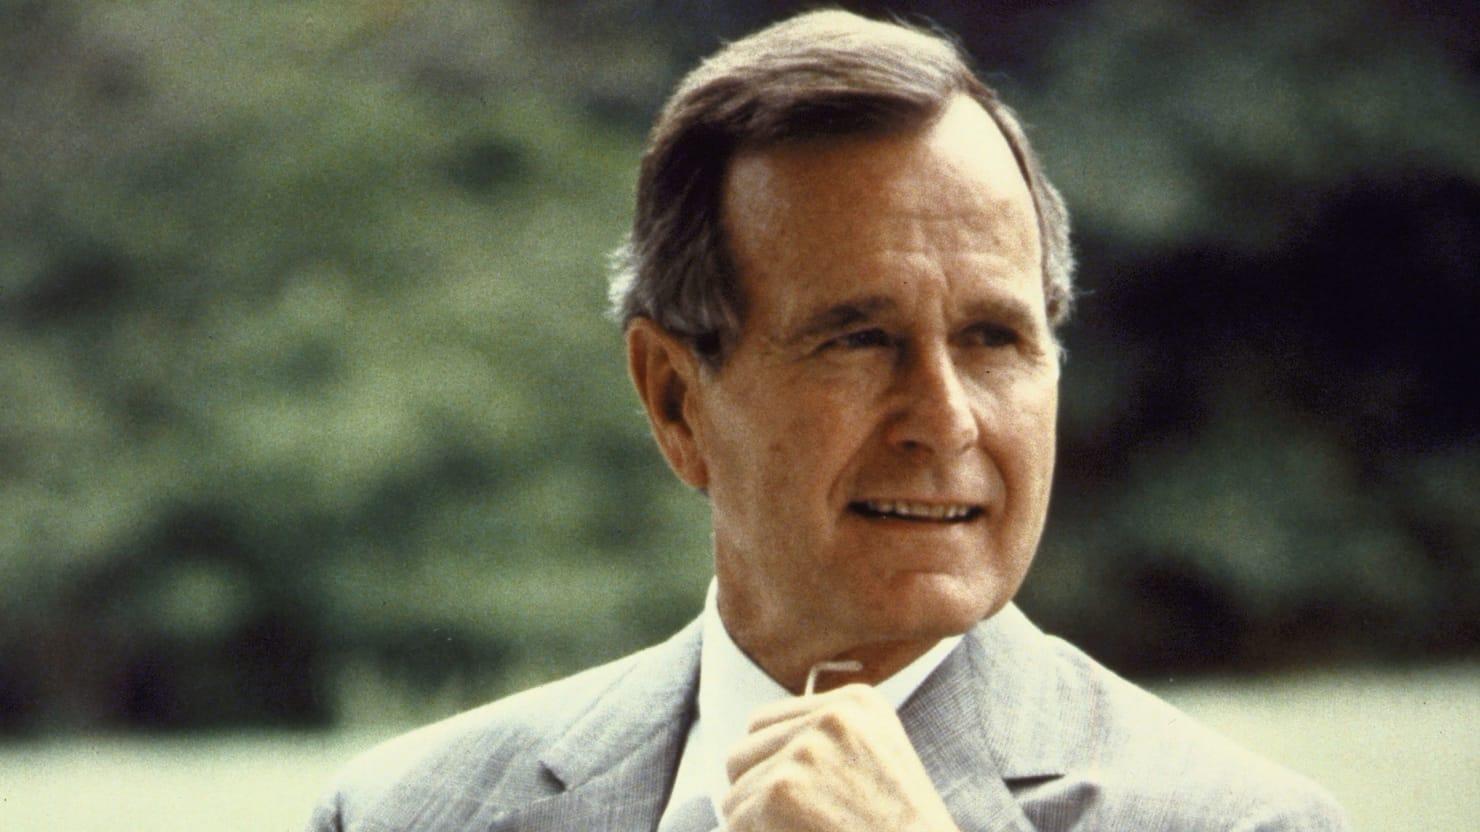 George HW. Bush, photo via  Getty Images